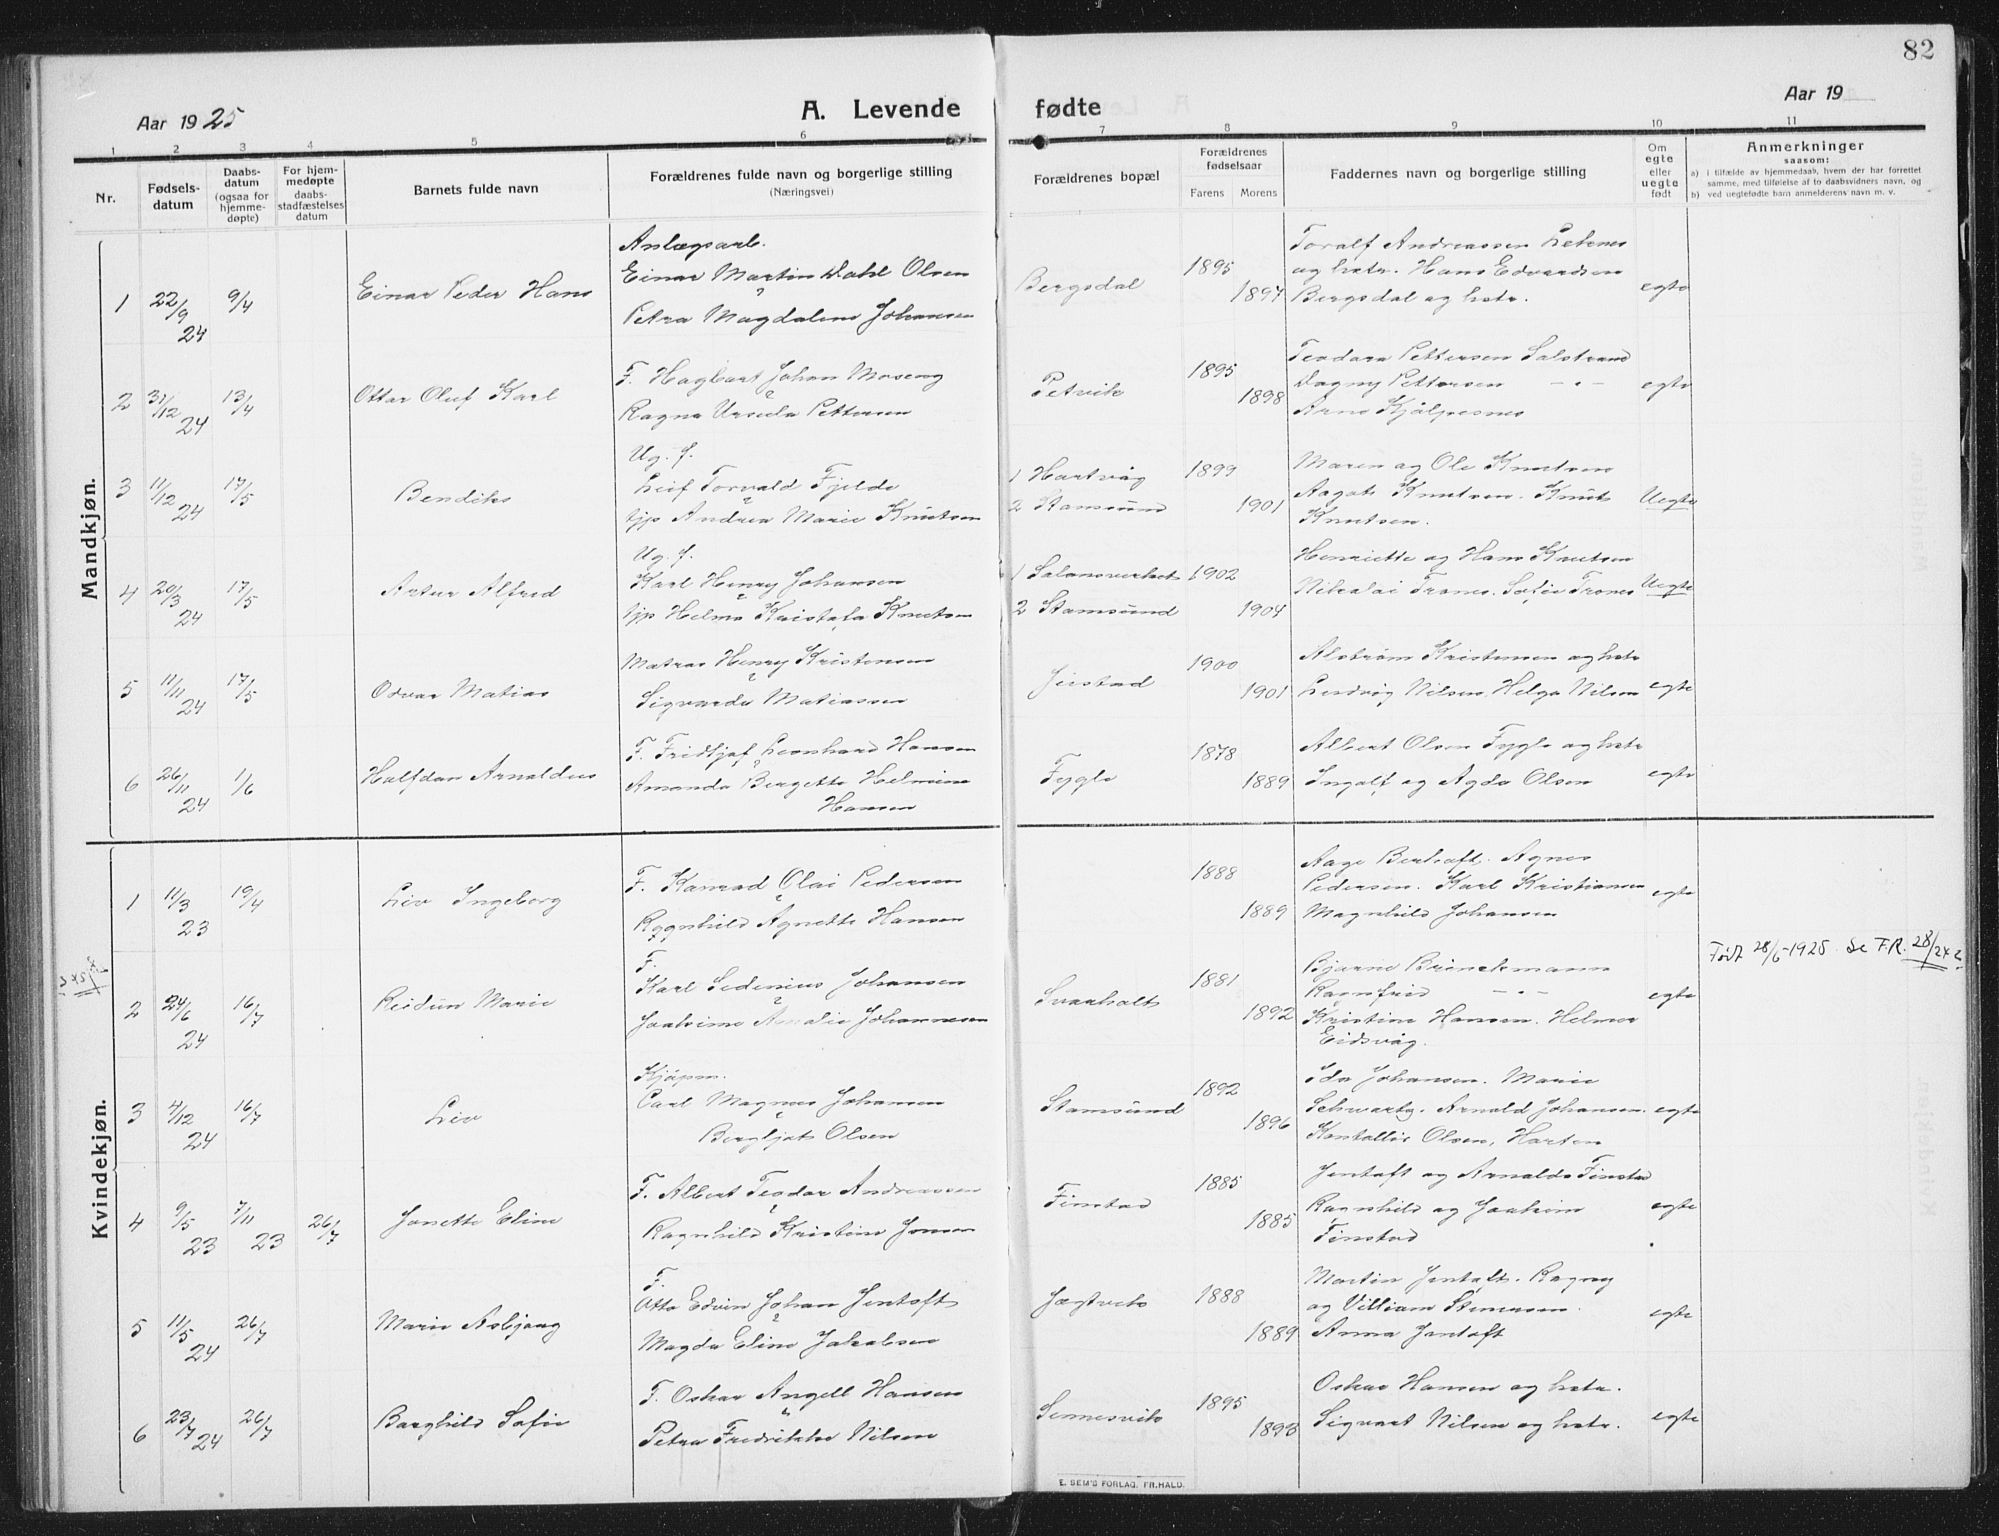 SAT, Ministerialprotokoller, klokkerbøker og fødselsregistre - Nordland, 882/L1183: Klokkerbok nr. 882C01, 1911-1938, s. 82